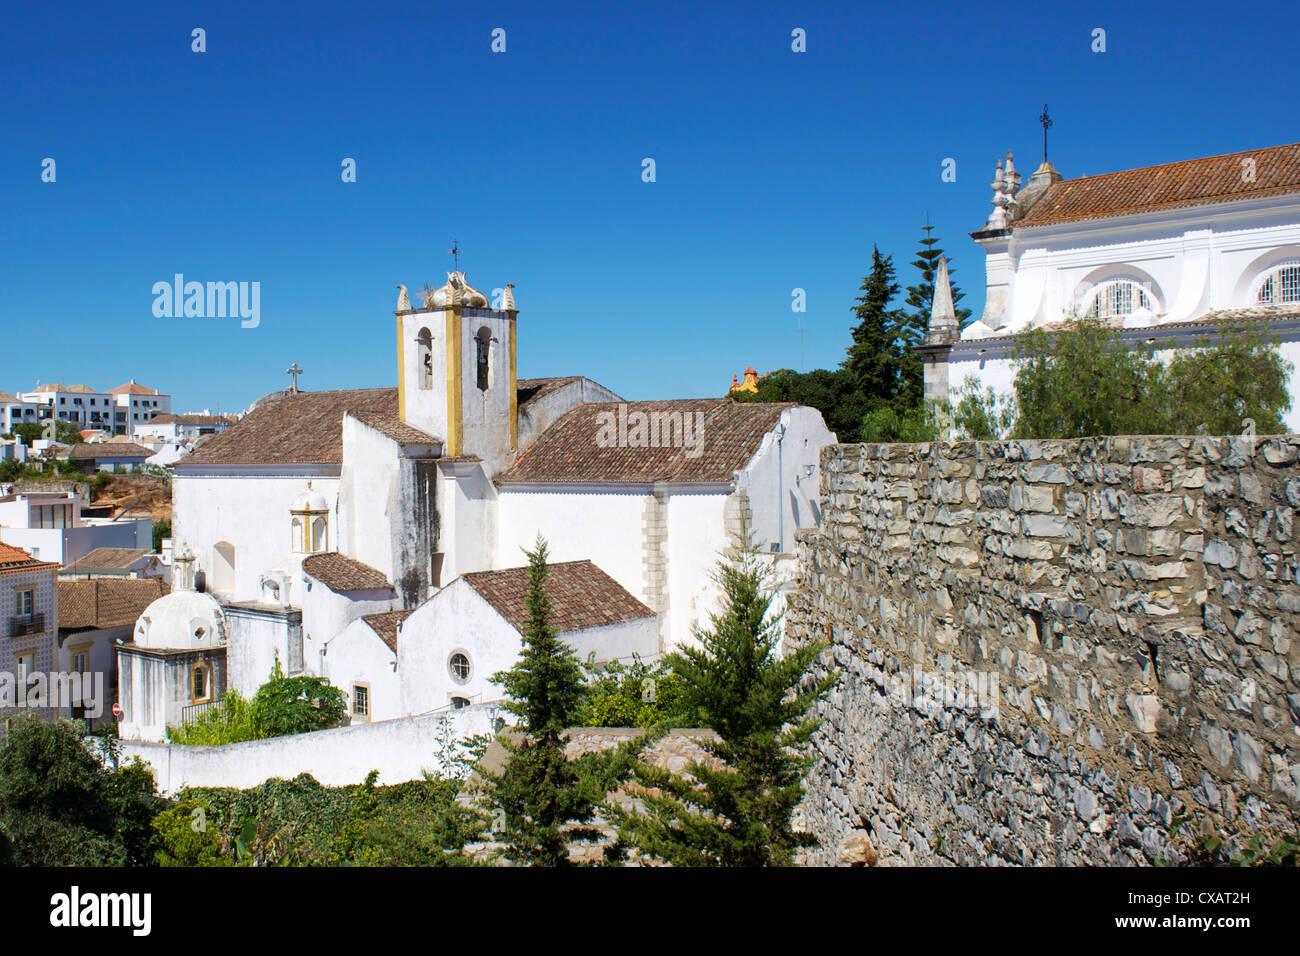 Old Town, Tavira, Algarve, Portugal, Europe - Stock Image